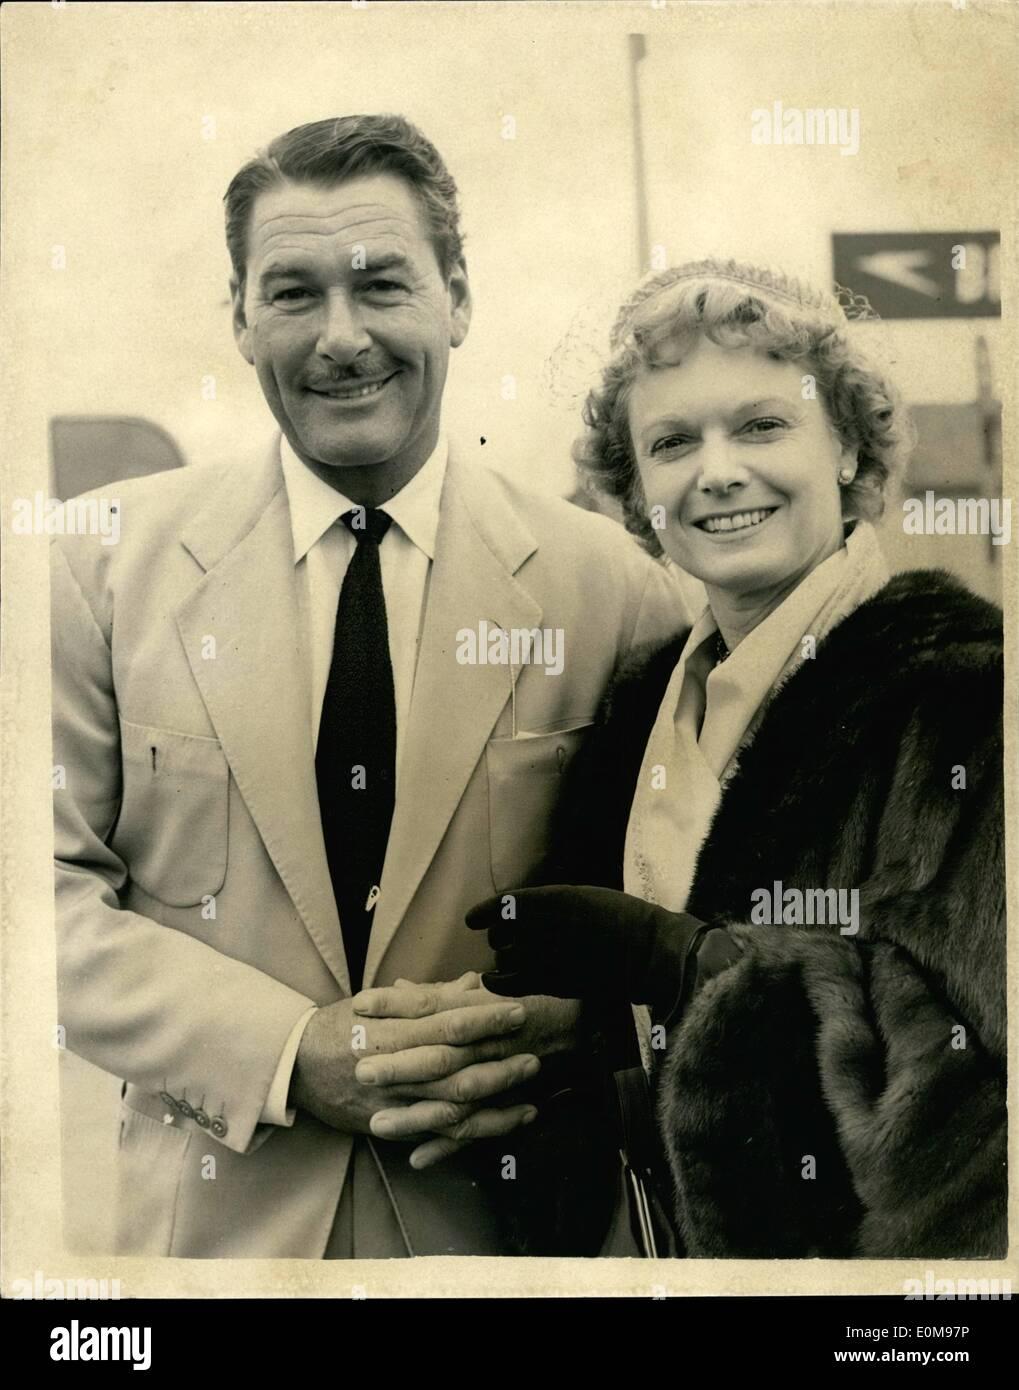 Apr. 04, 1954 - Errol Flynn Arrives.: Hollywood film star Errol Flynn, who is to star with Anna Neagle in her next - Stock Image